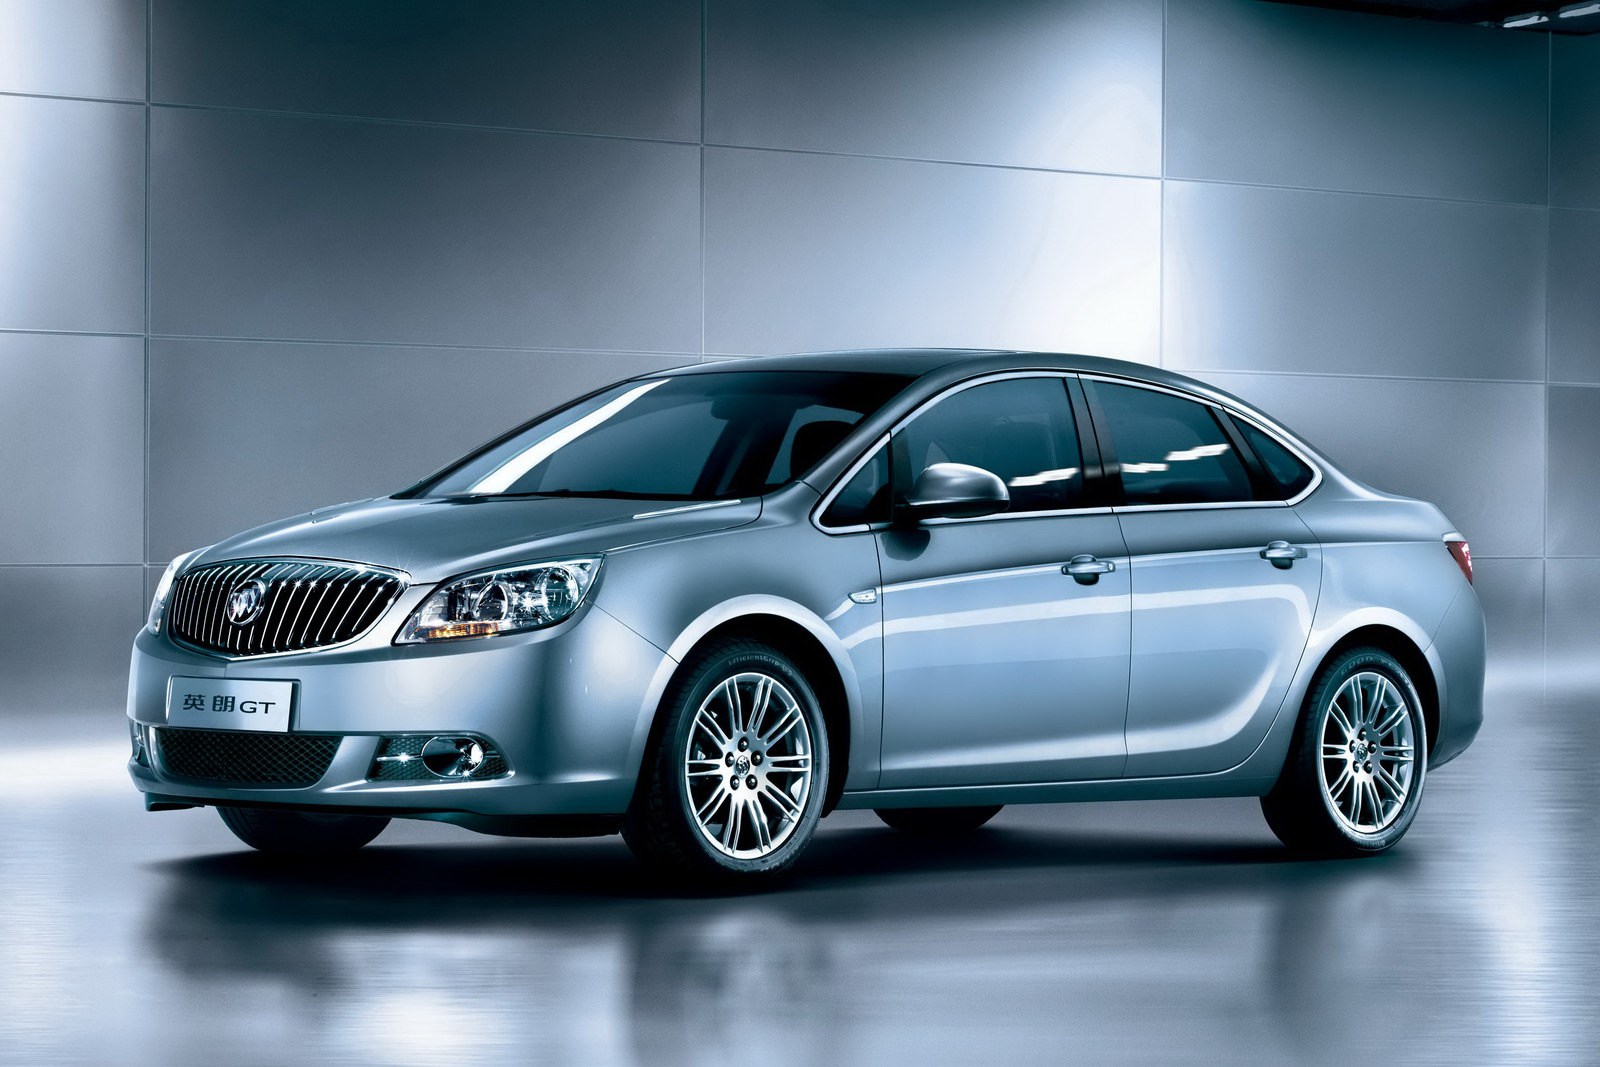 2010 Buick Verano Opel Astra Sedan To Be Built In